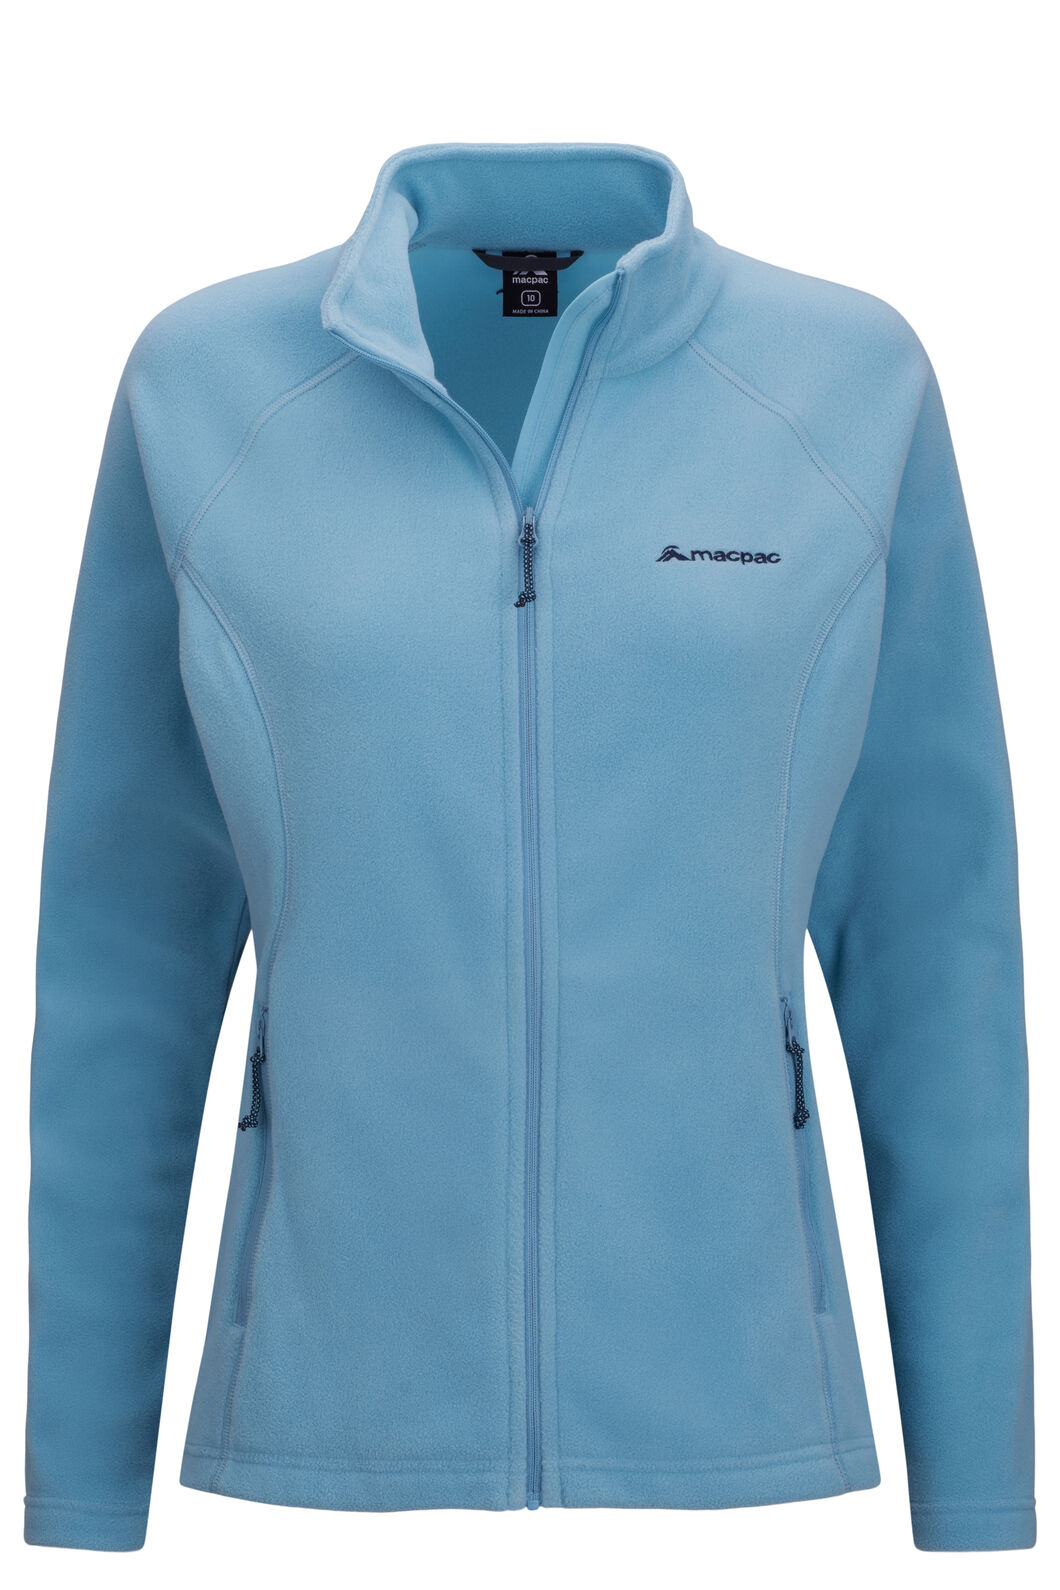 Macpac Women's Tui Polartec® Micro Fleece® Jacket, Delphinium, hi-res